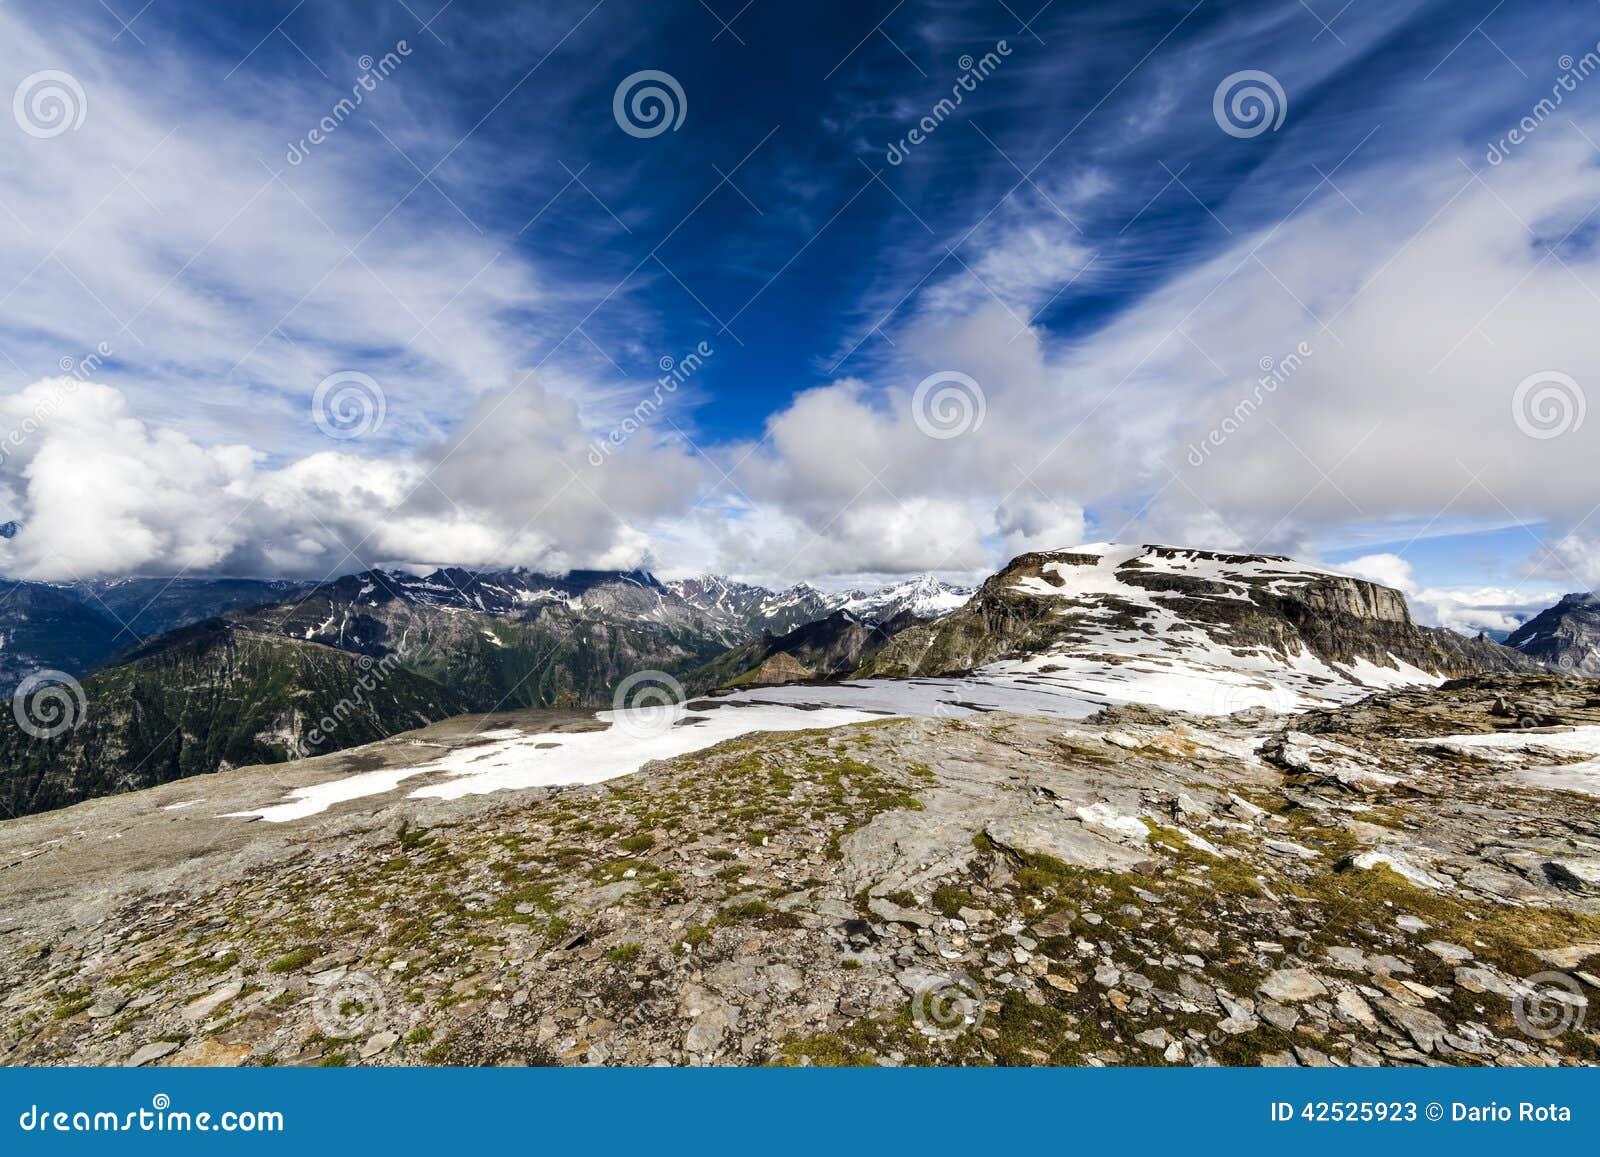 Halny skalisty krajobraz